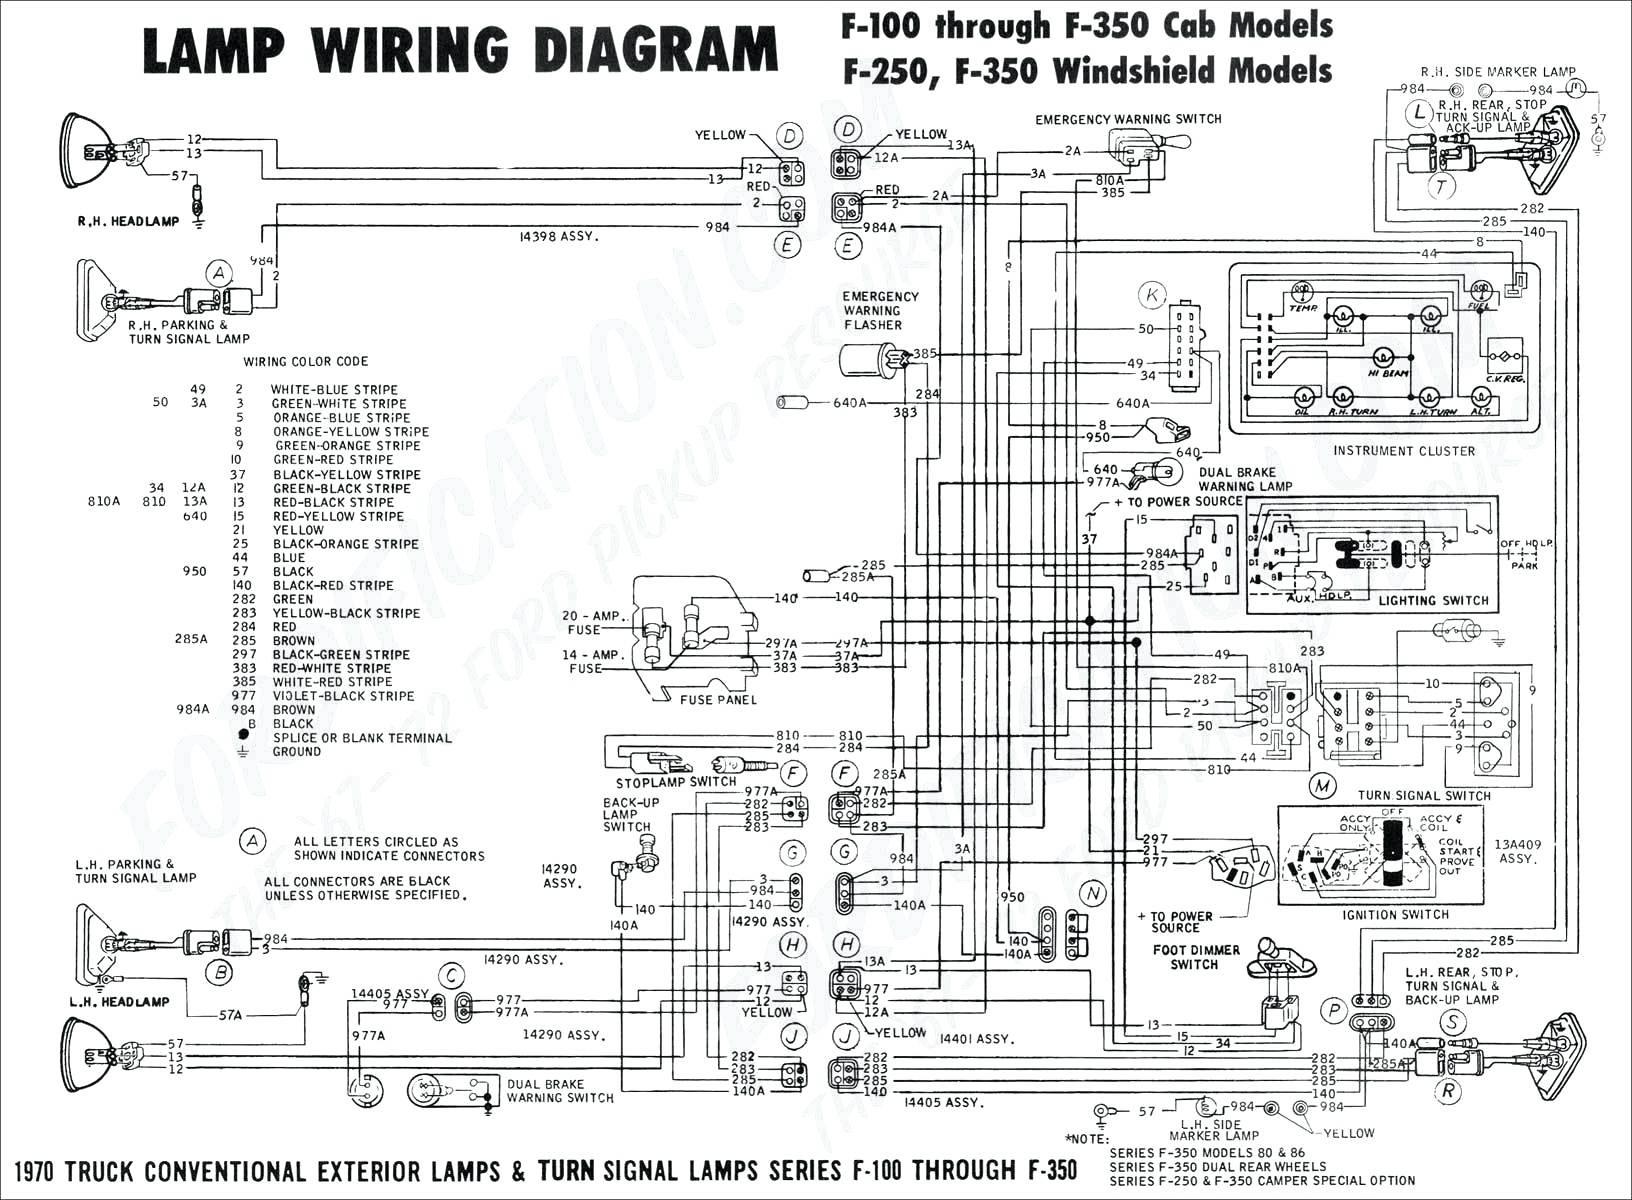 wiring diagrams archives page 45 of 116 binatanicom wiring diagram